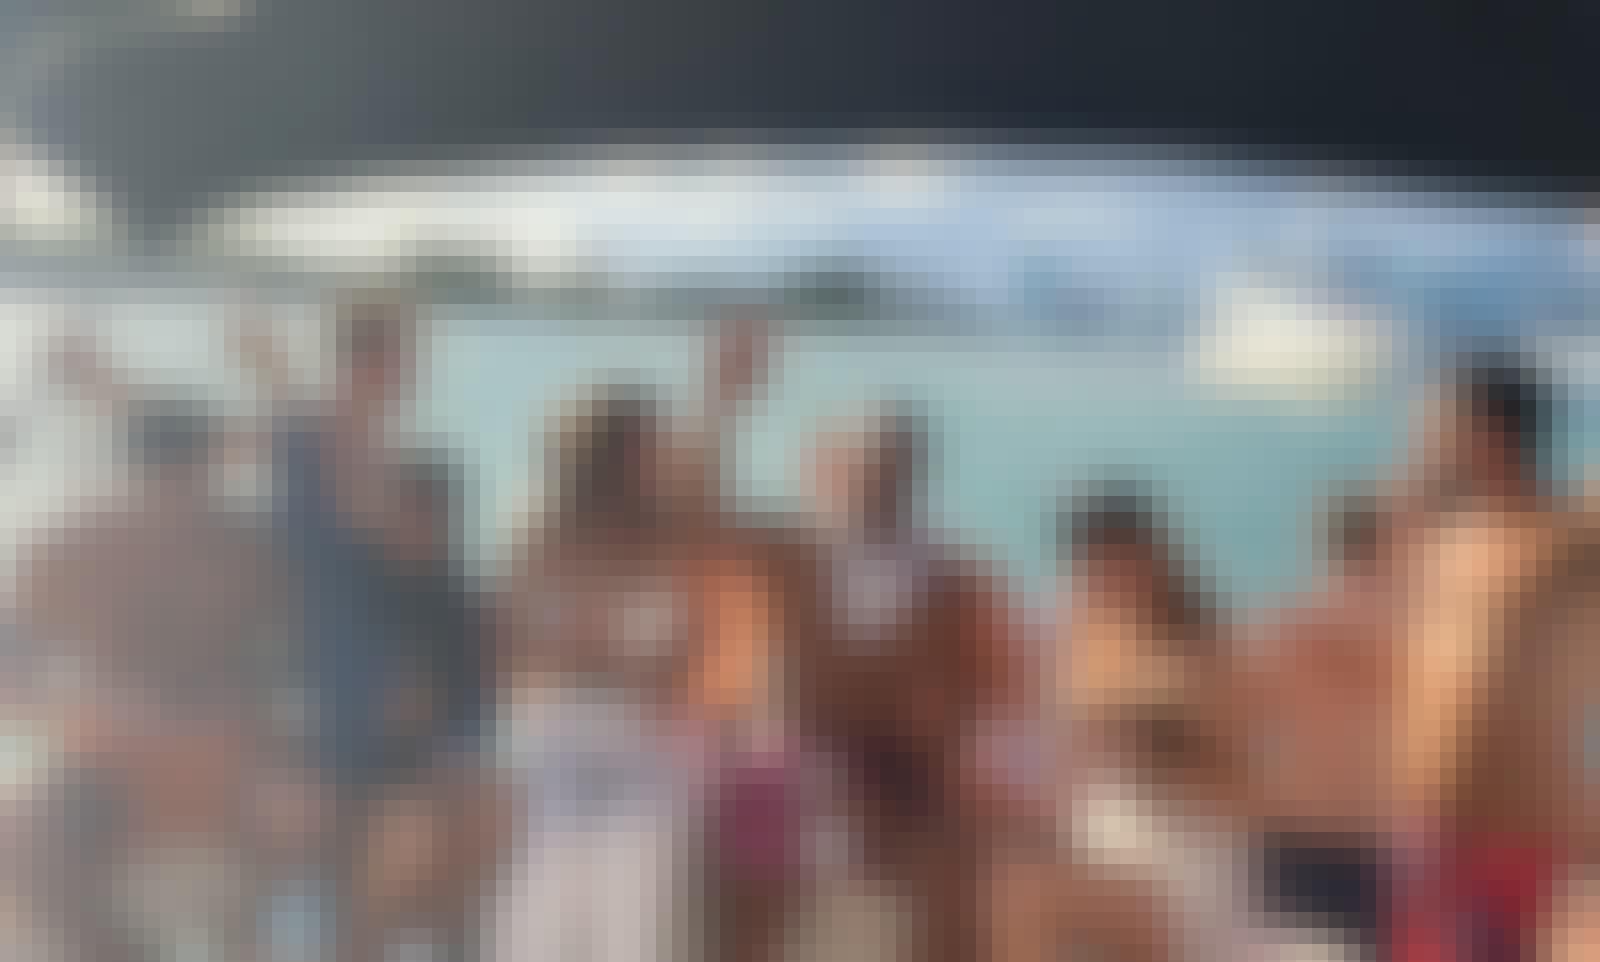 45' Sea Ray Sundancer boat. Best boat rental experience in Miami.